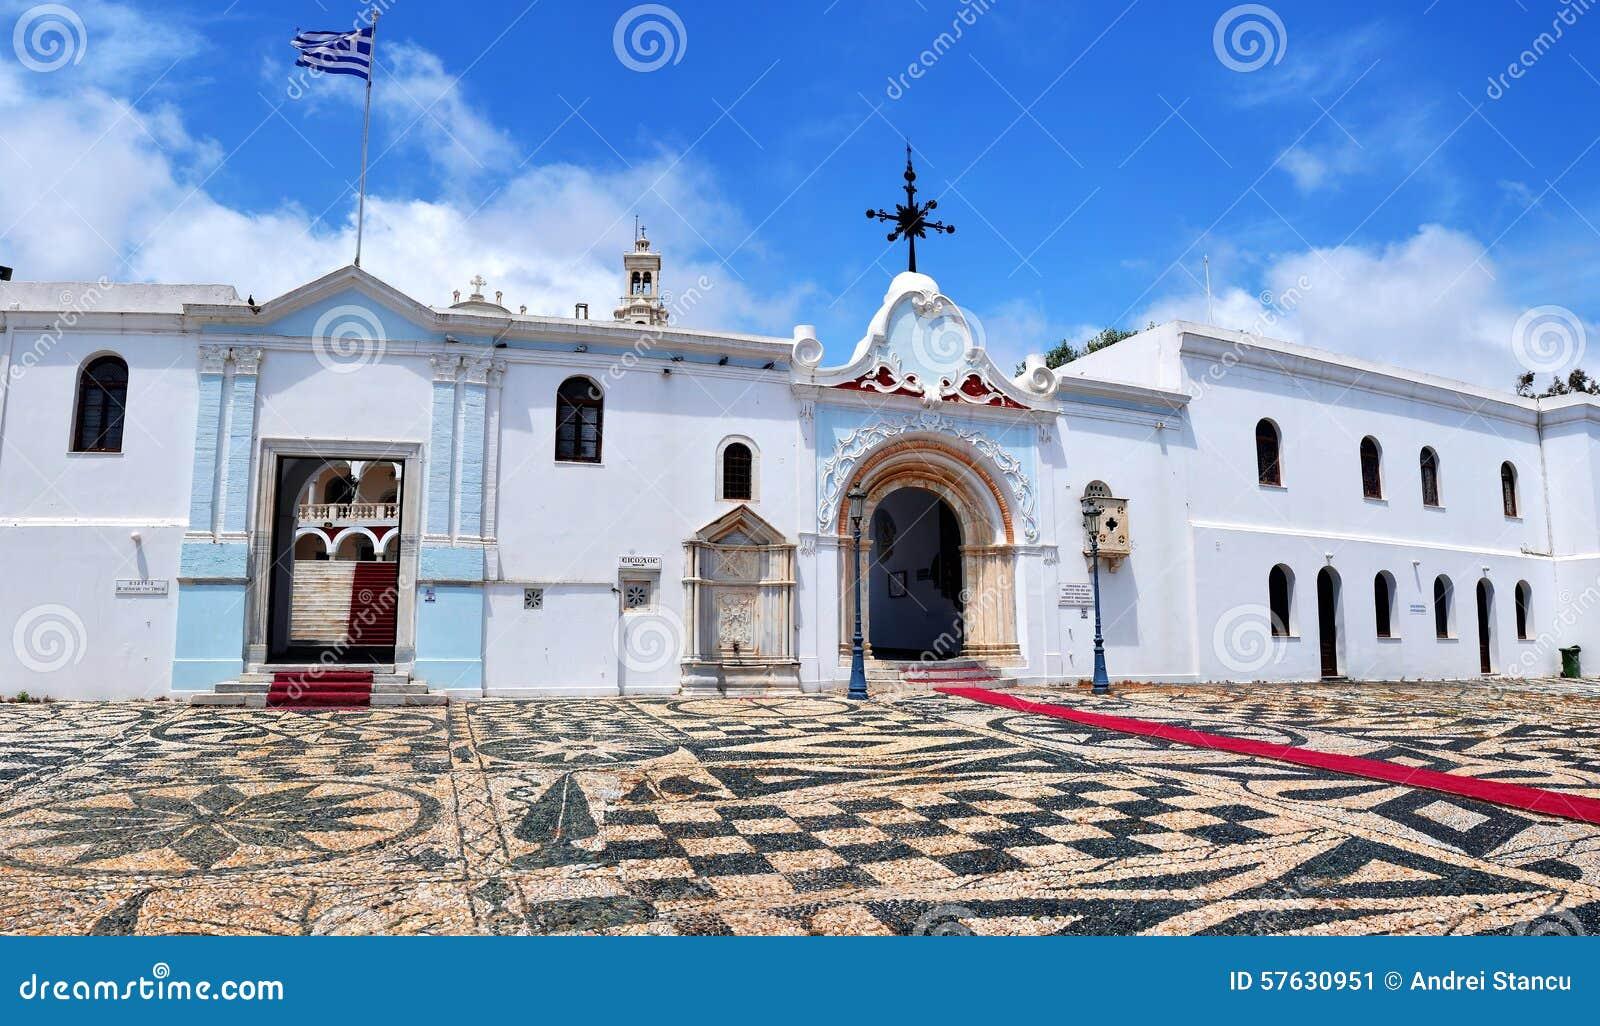 The Madonna Church At Tinos Island Stock Photo - Image ...